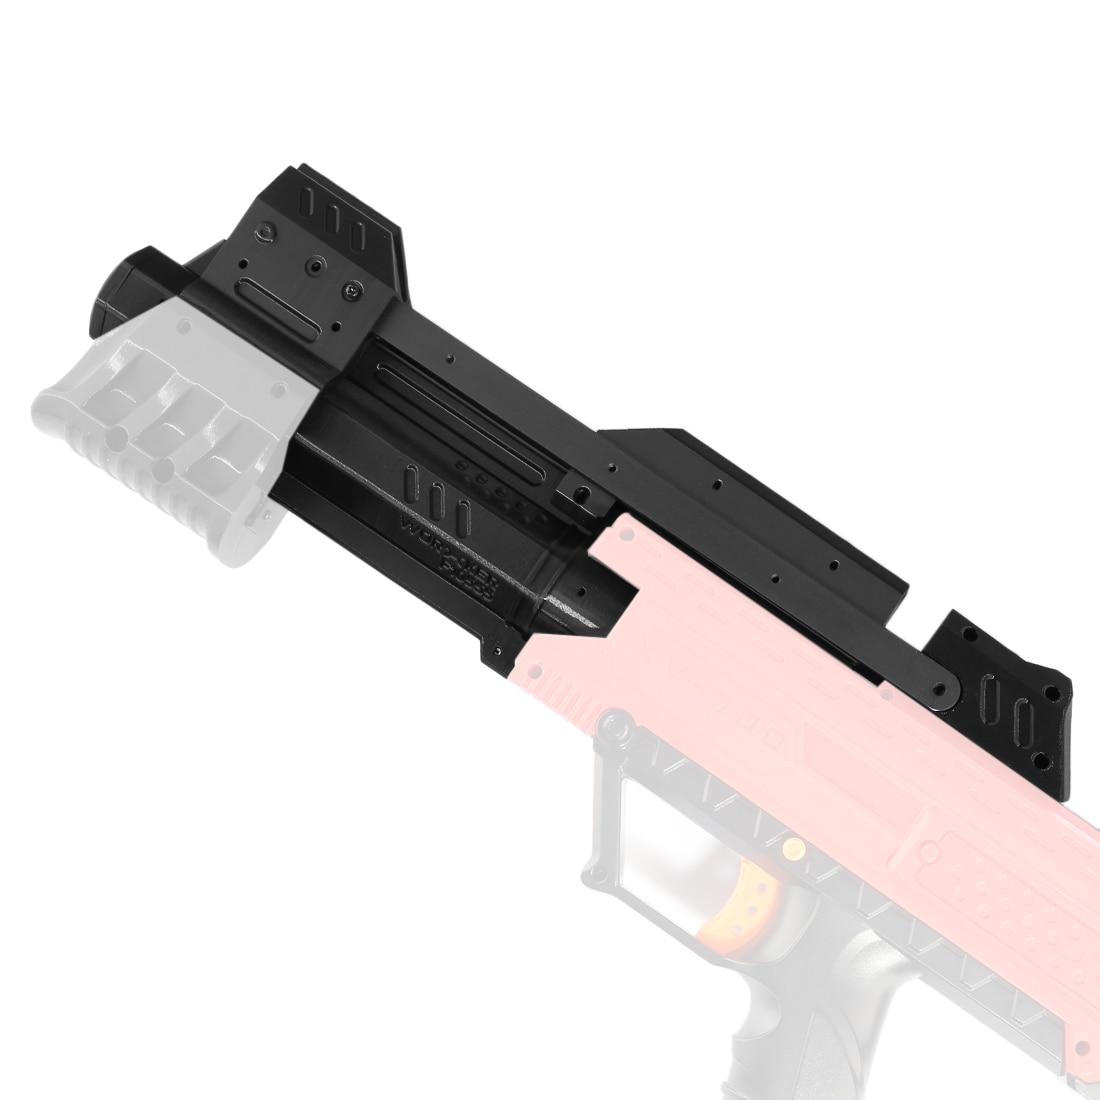 TRAVAILLEUR f10555 3D Impression Pull-down Kit pour Nerf Rival Apollo XV-700-Noir